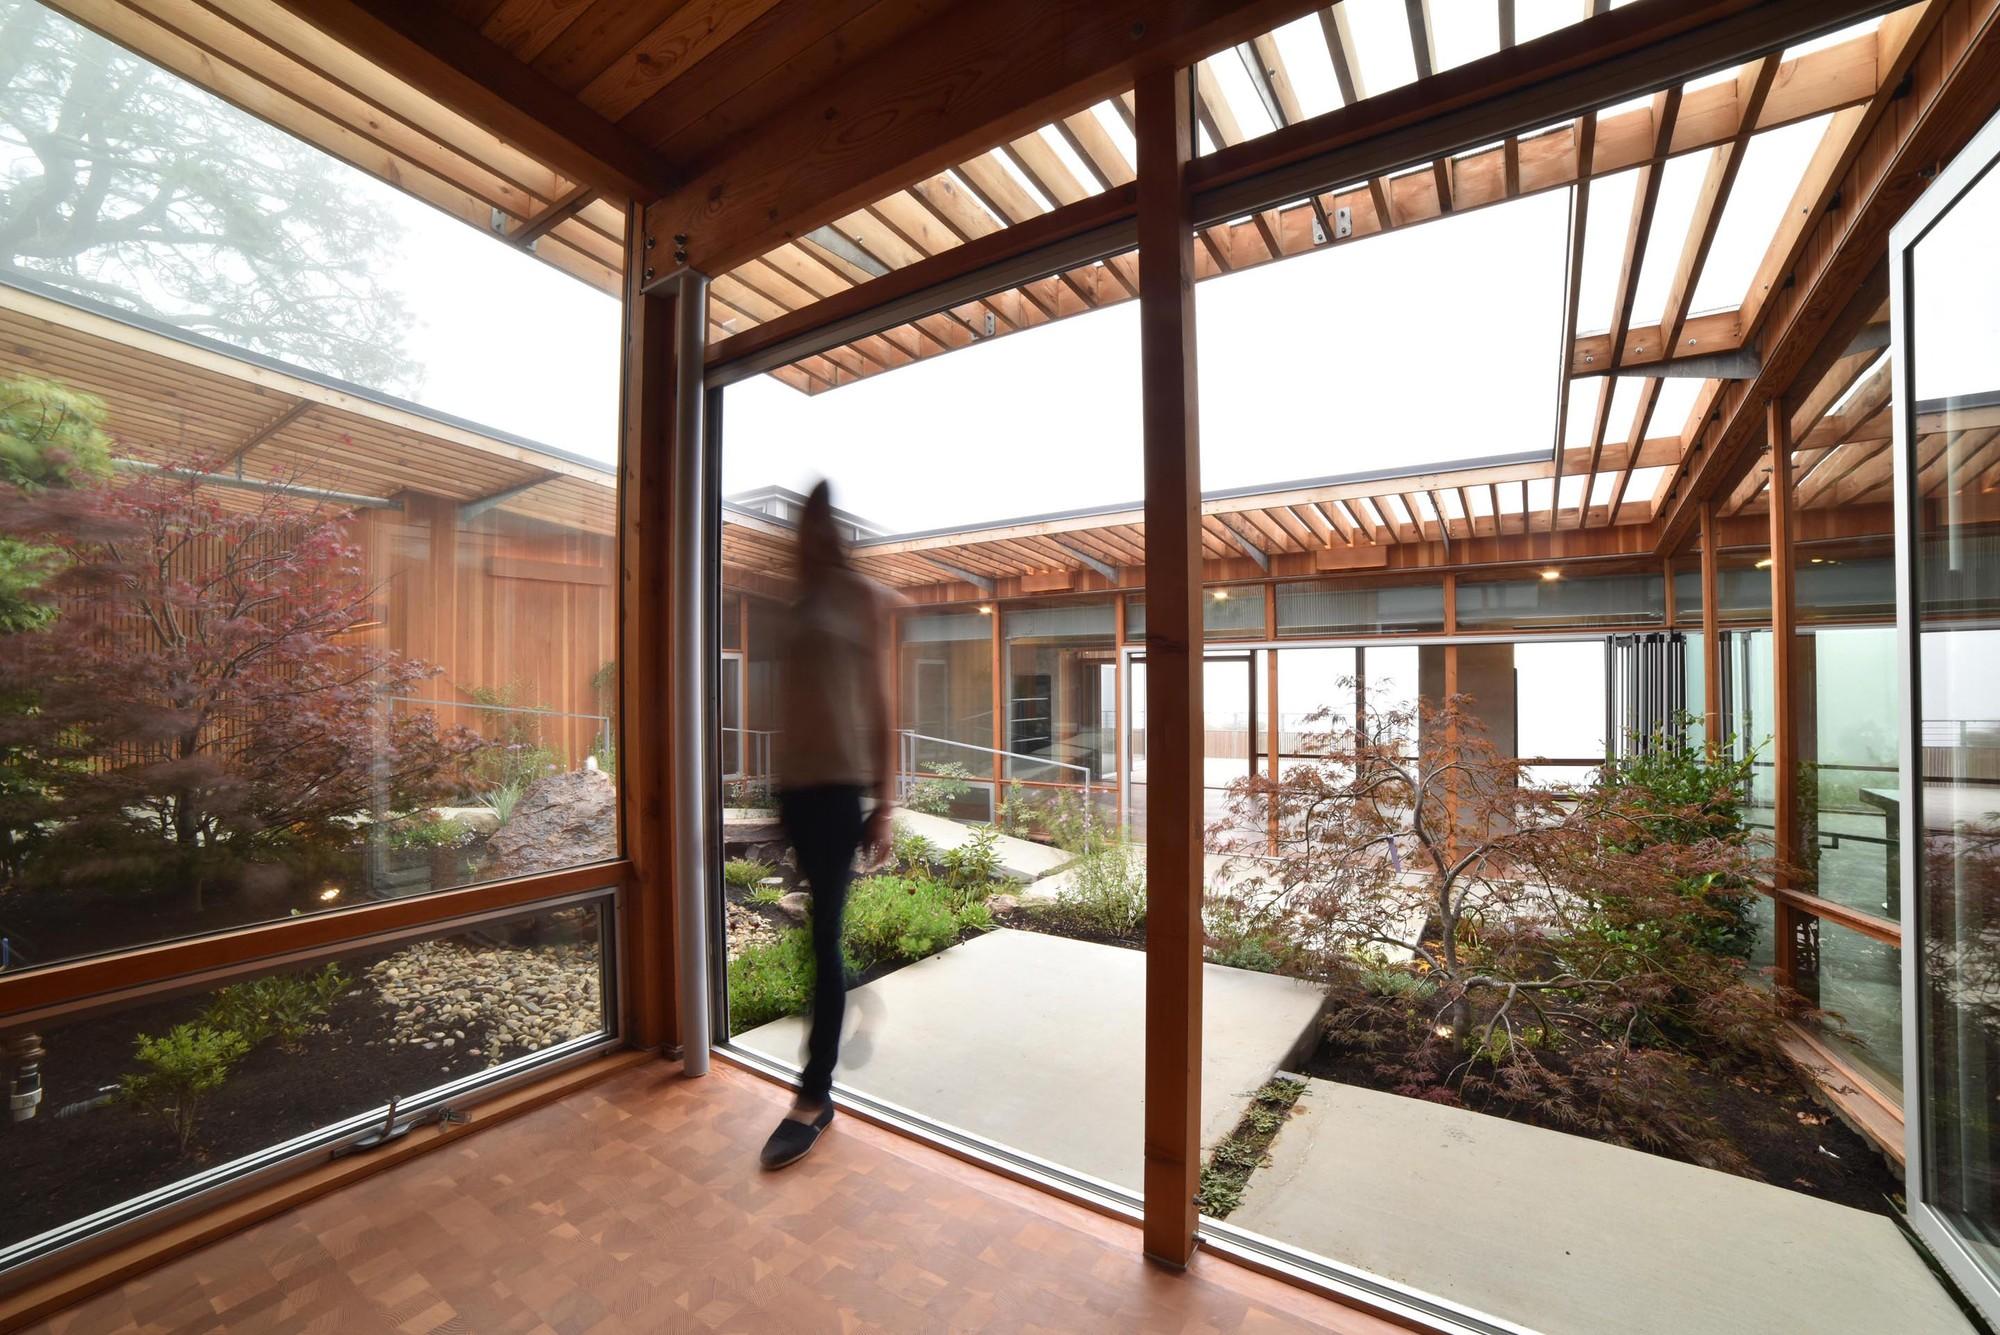 Casa Fénix / Anderson Anderson Architecture, © Anthony Vizzari